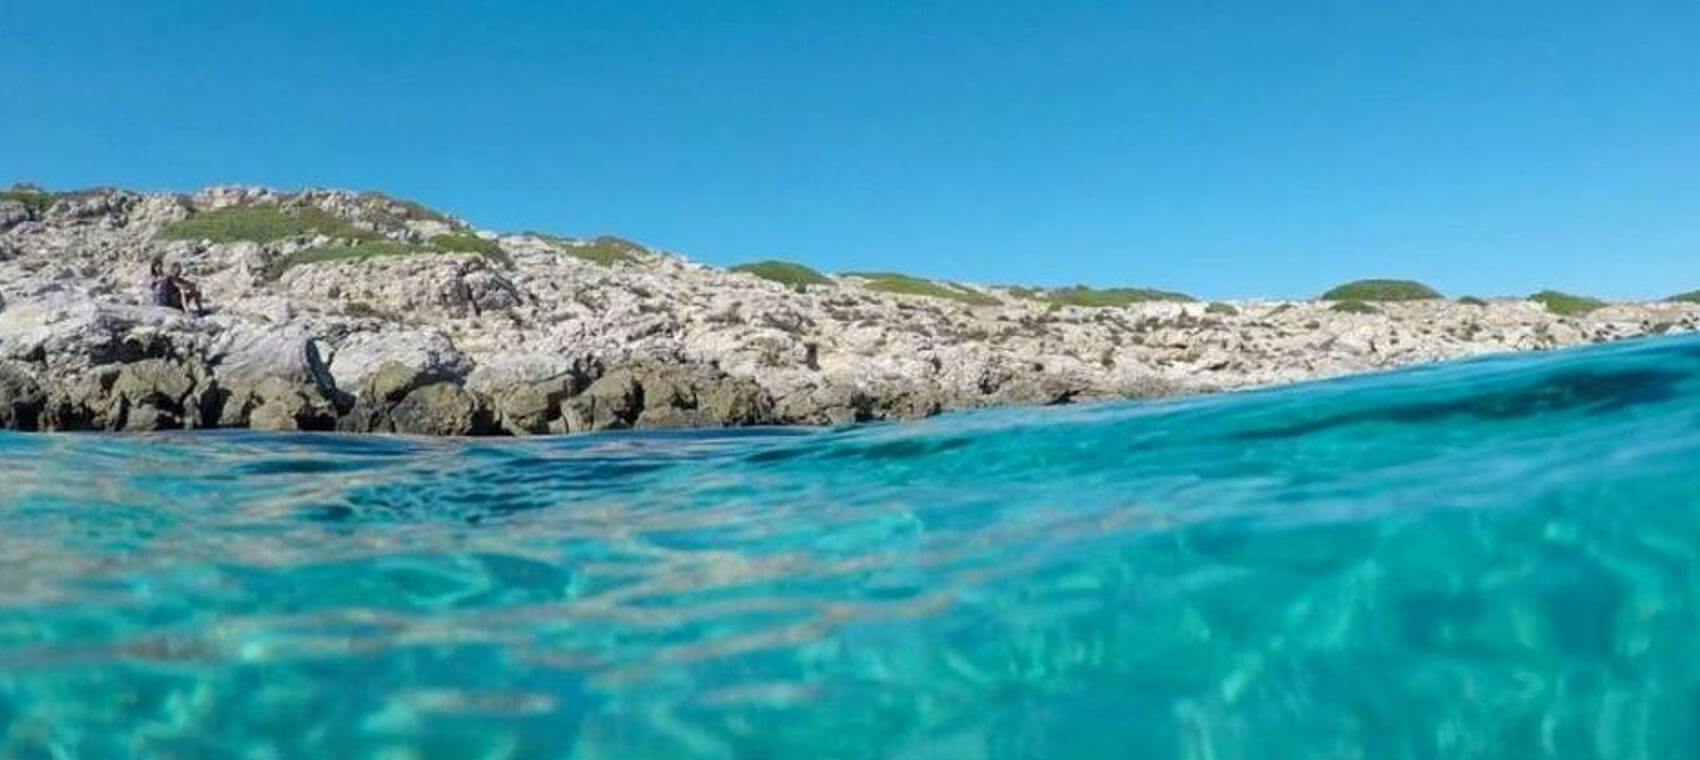 Mare Favignana